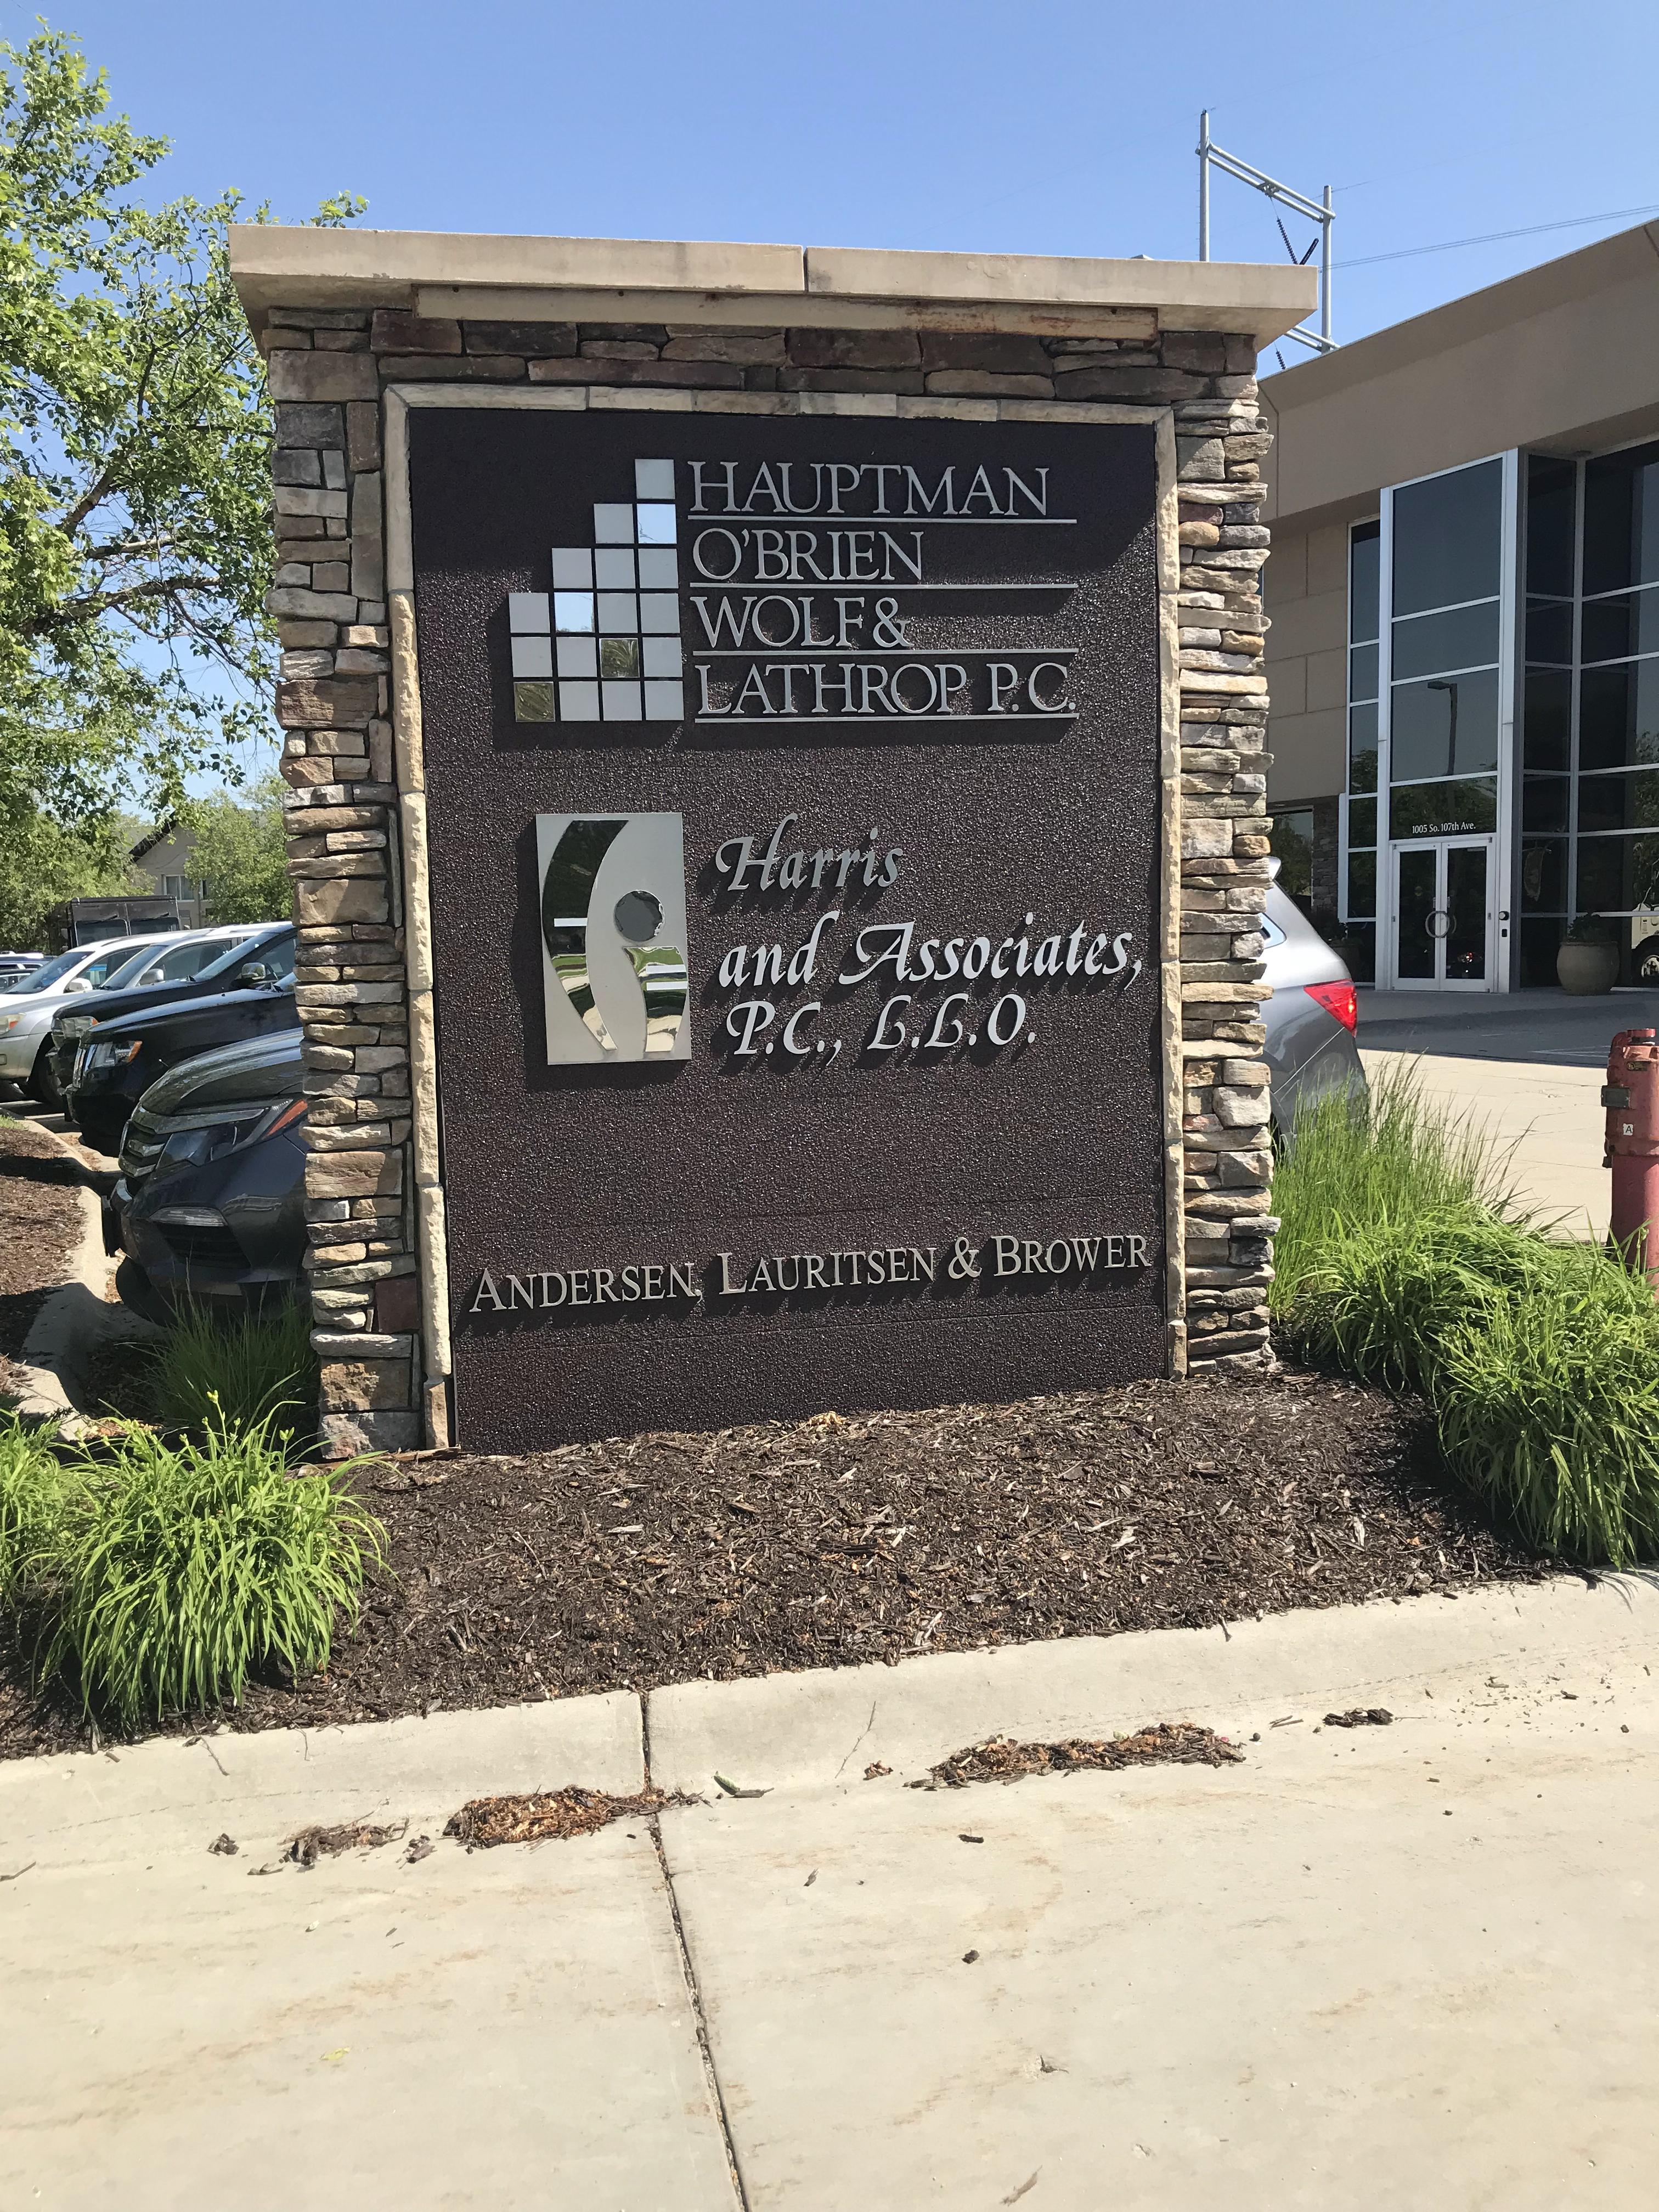 Harris & Associates, P.C., L.L.O